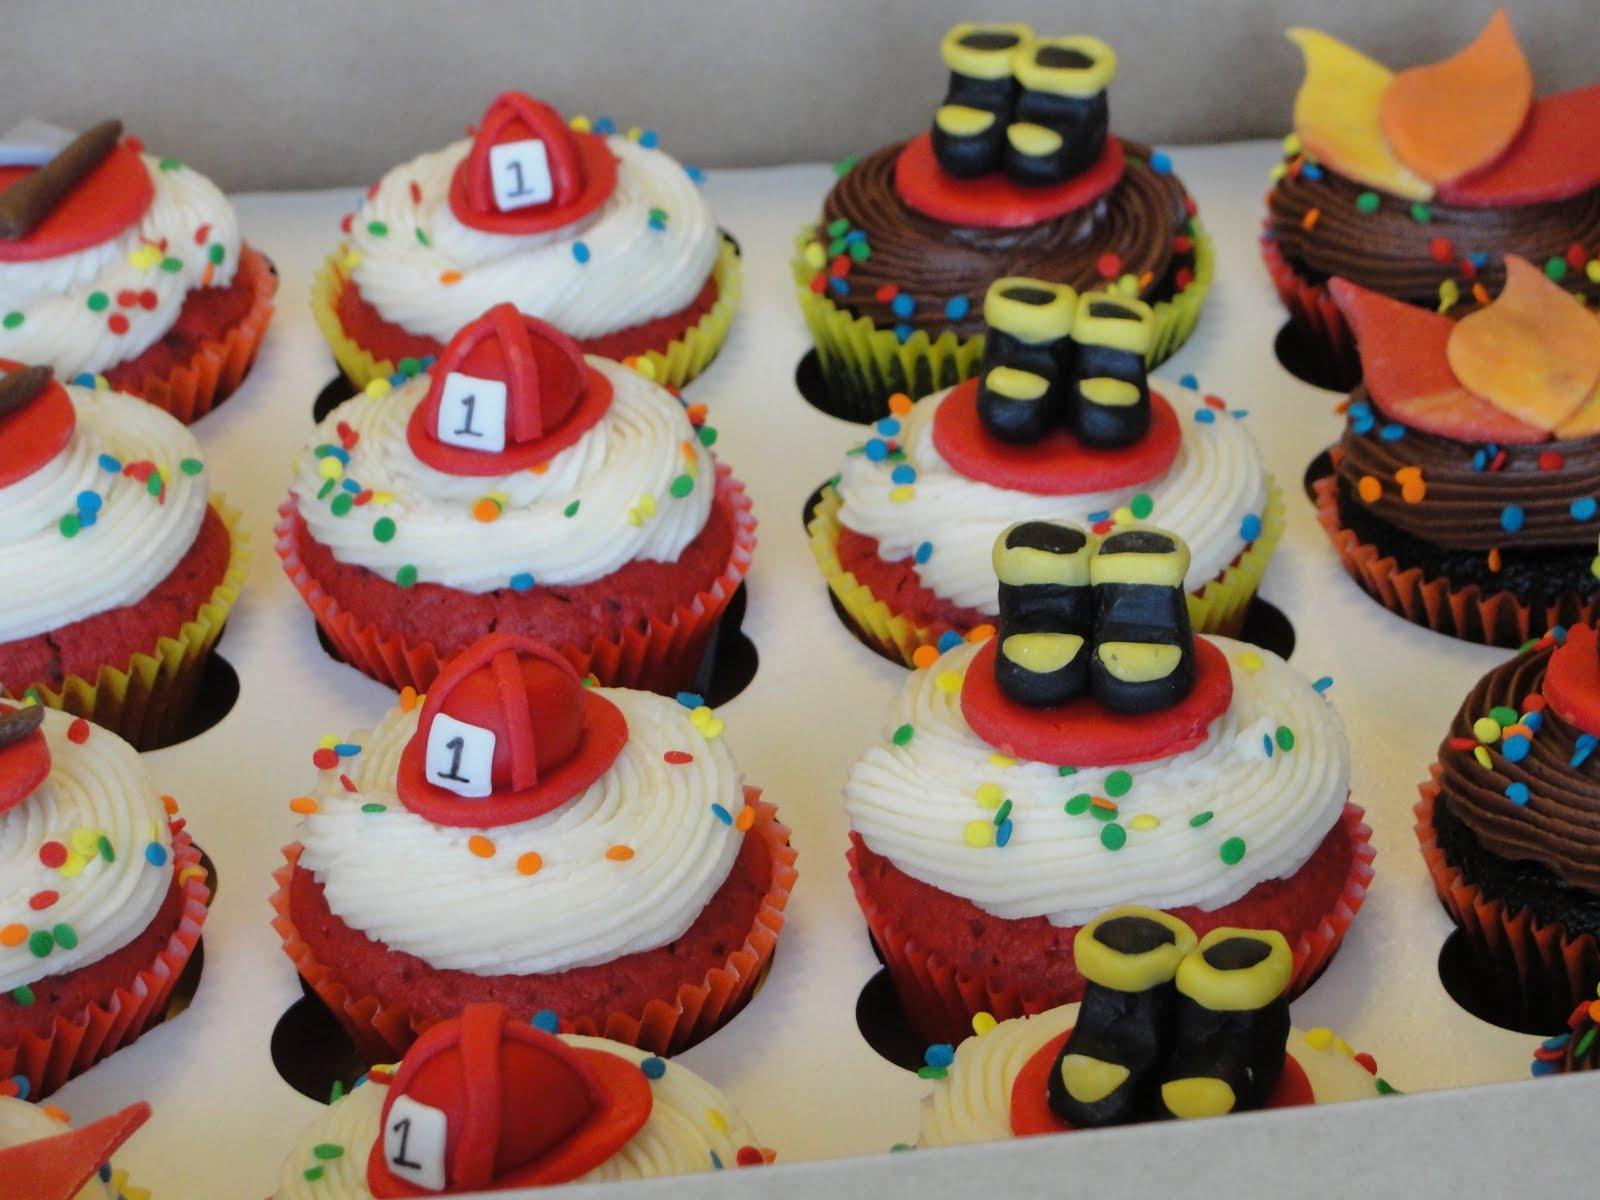 12 Photos of Firefighter Cupcake Cakes